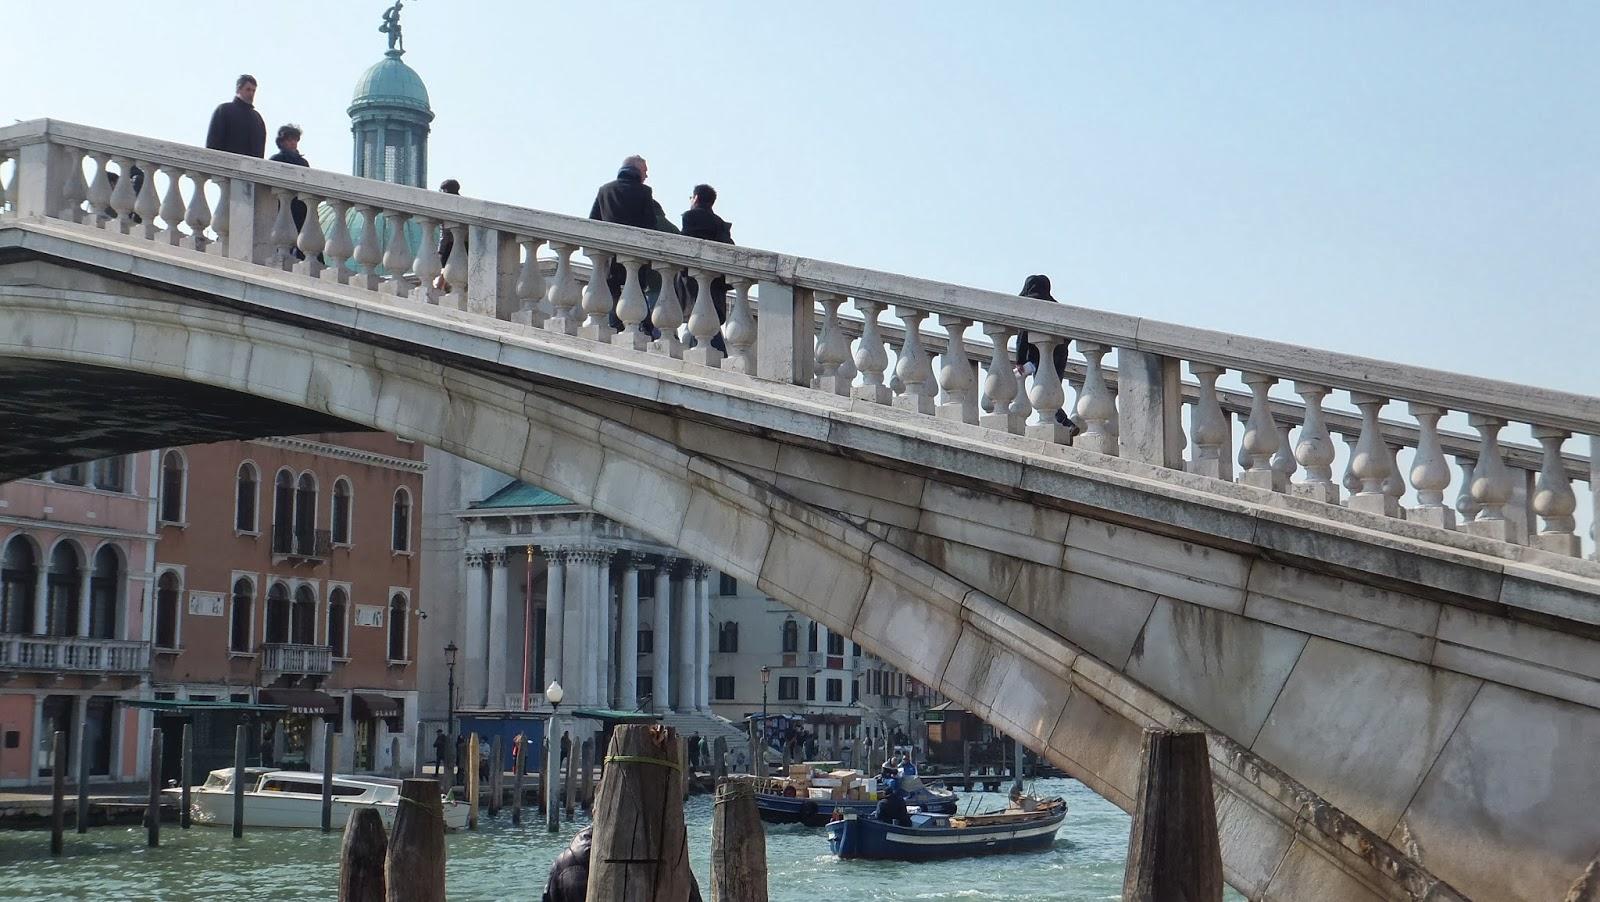 Ponte degli Scalzi, Venecia, Italia, Elisa N, Blog de Viajes, Lifestyle, Travel